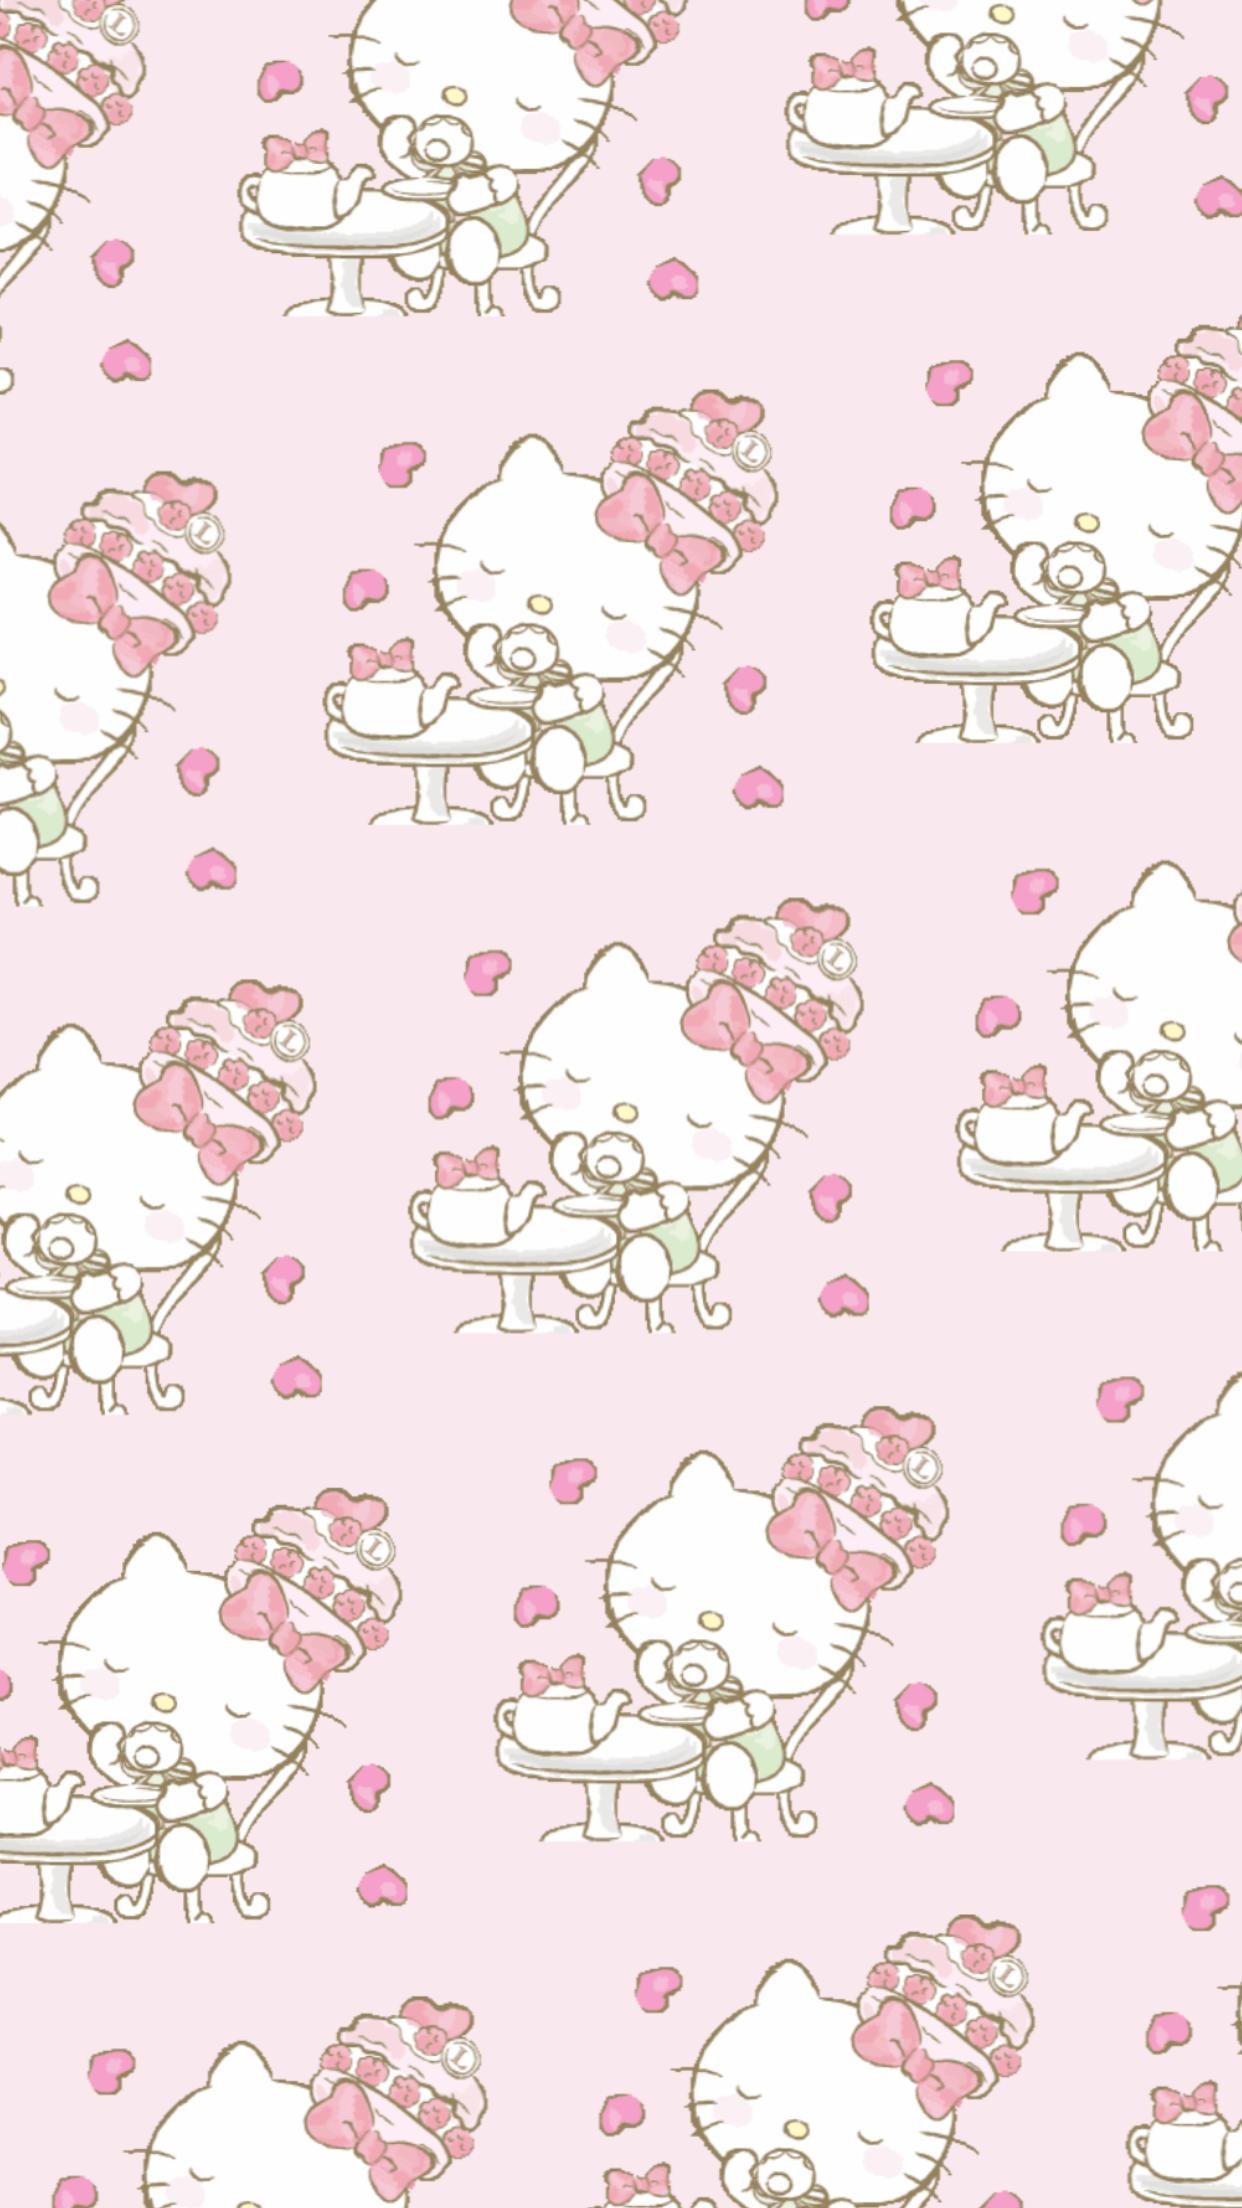 Wallpaper Hello Kitty Pictures Hello Kitty Images Hello Kitty Wallpaper